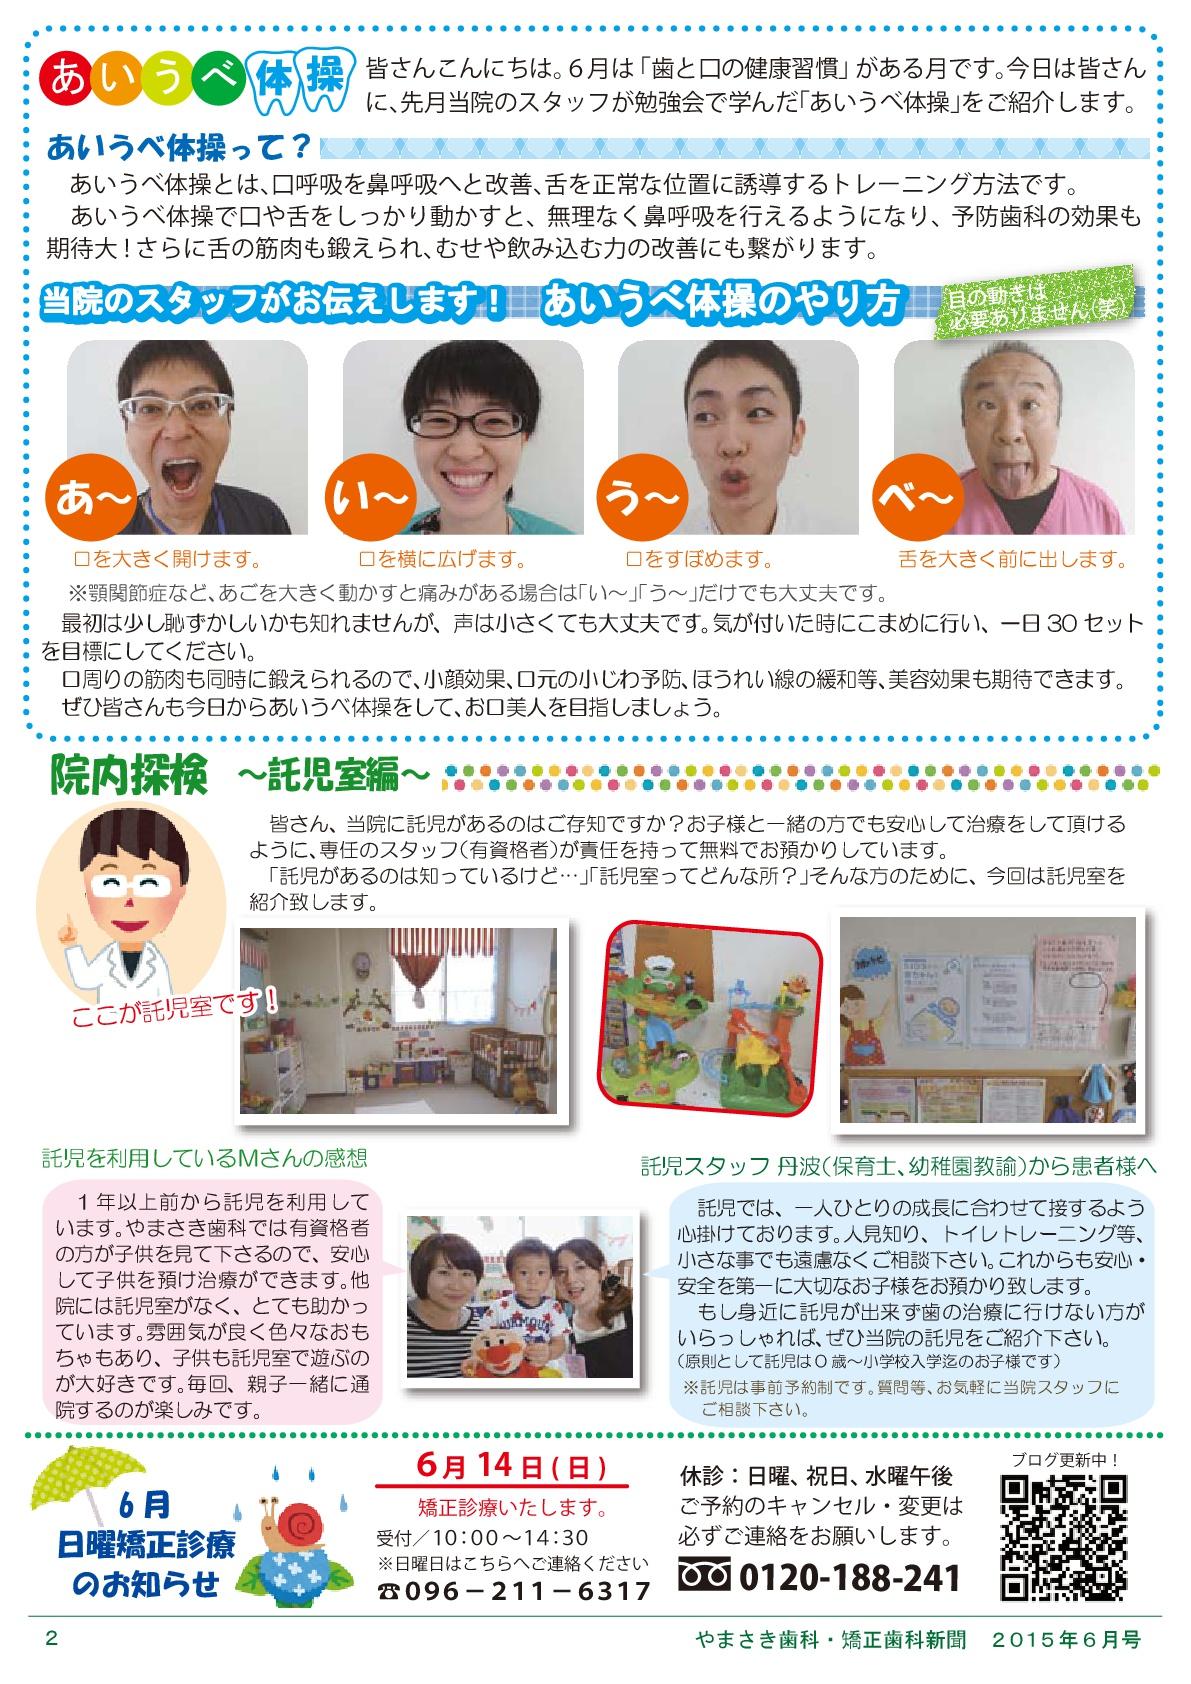 sinbun15-6-2-001